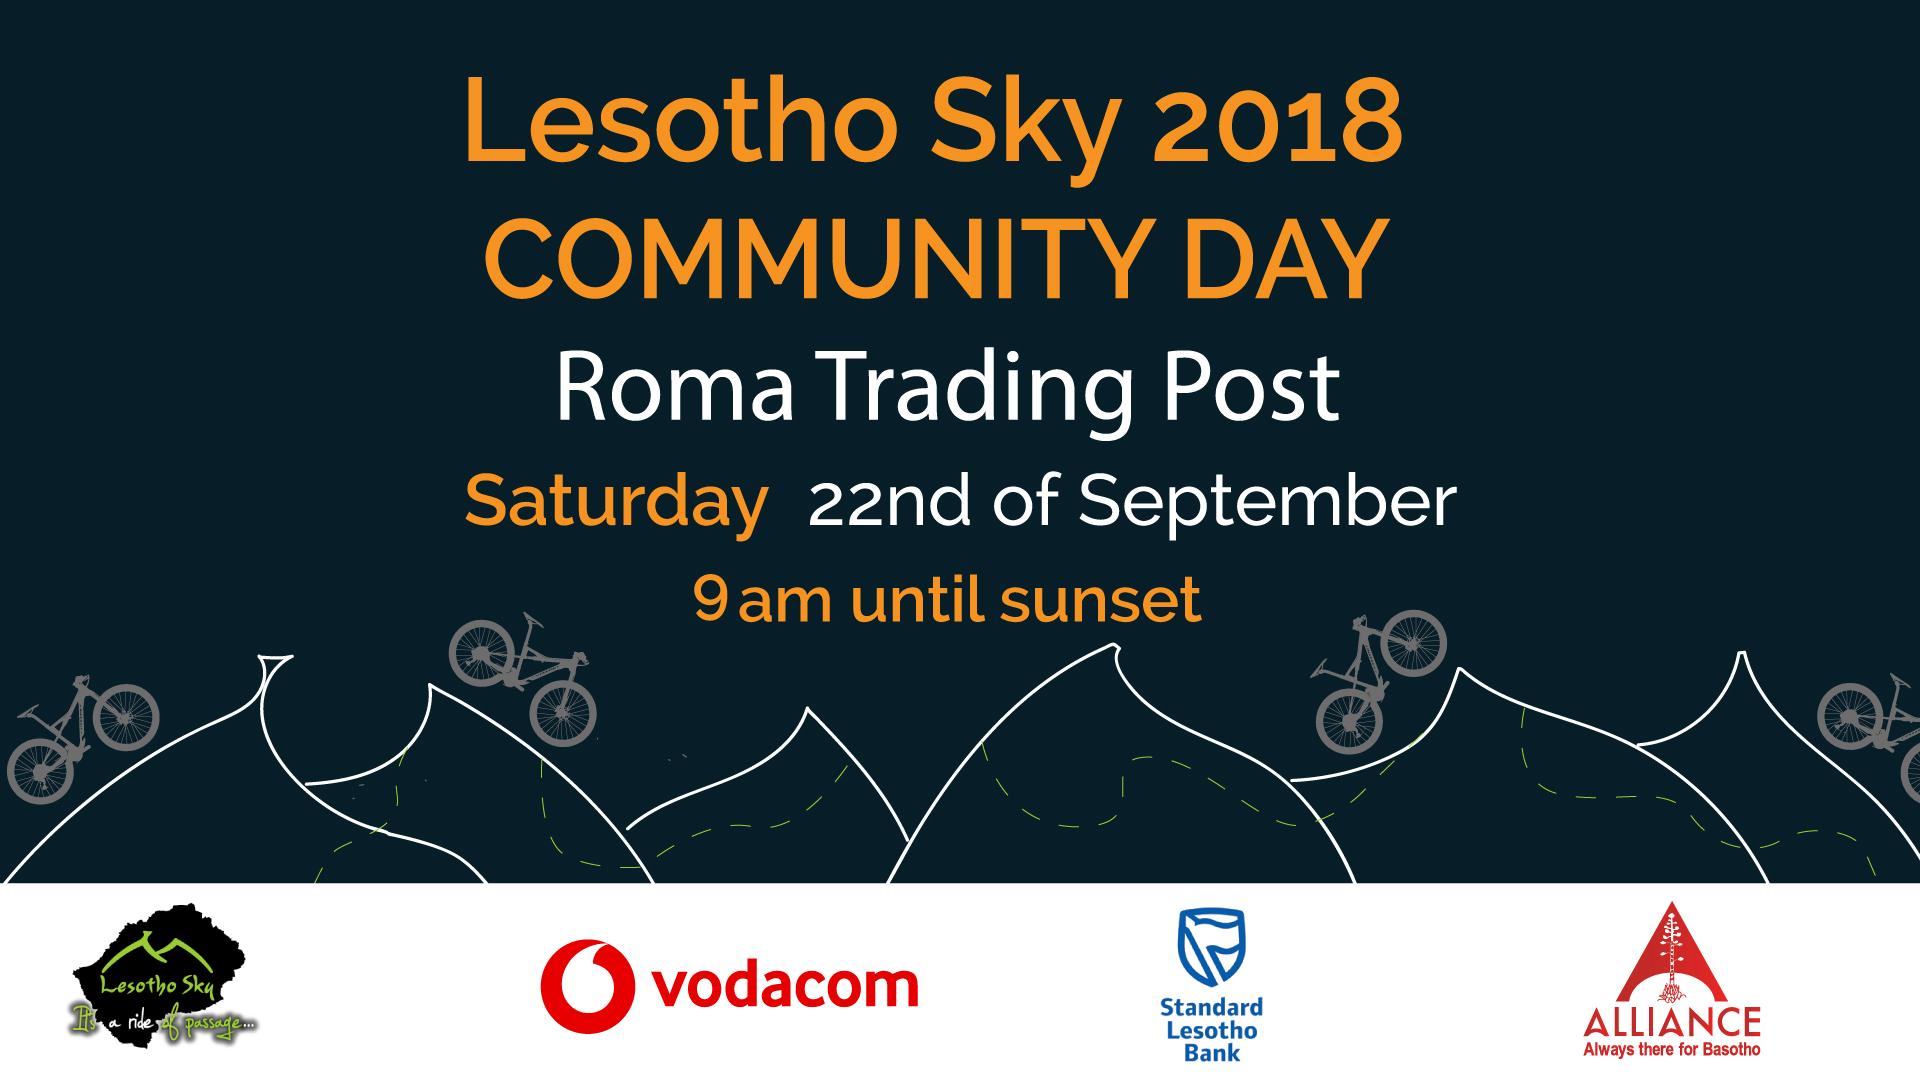 Lesotho Sky community day